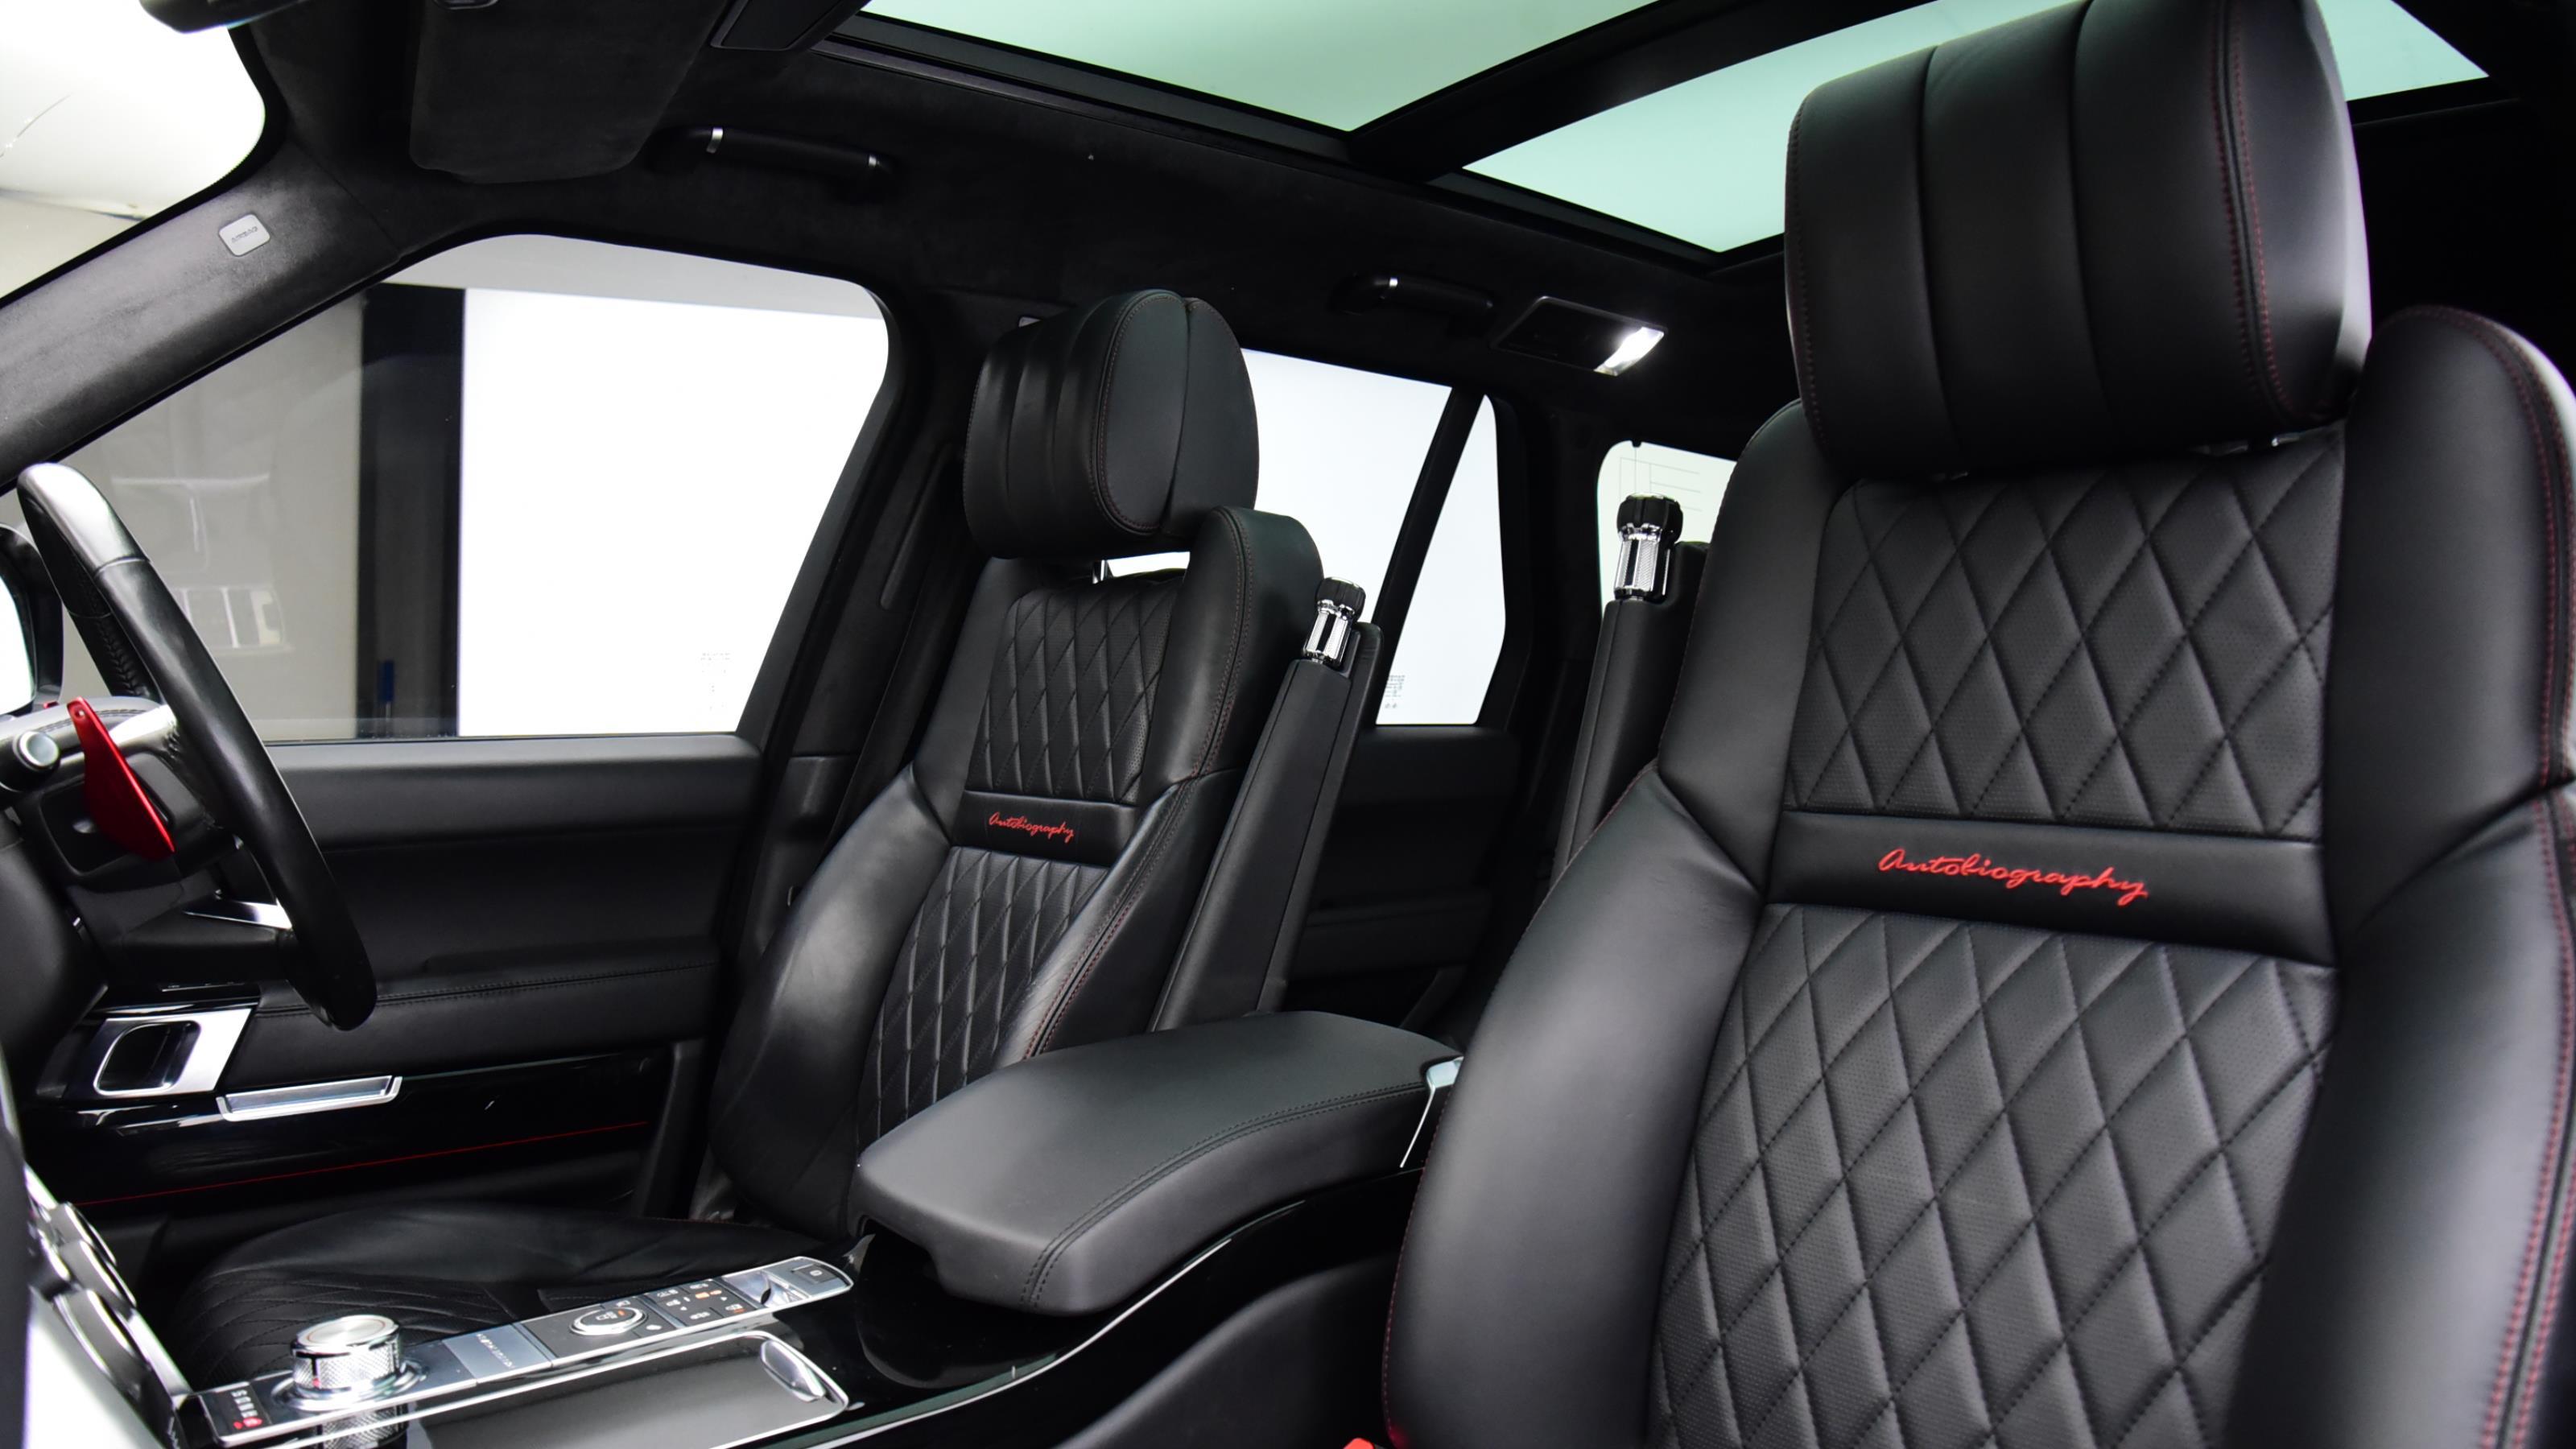 Used 2017 Land Rover RANGE ROVER 5.0 V8 S/C SVAutobiography Dynamic 4dr Auto BLACK at Saxton4x4